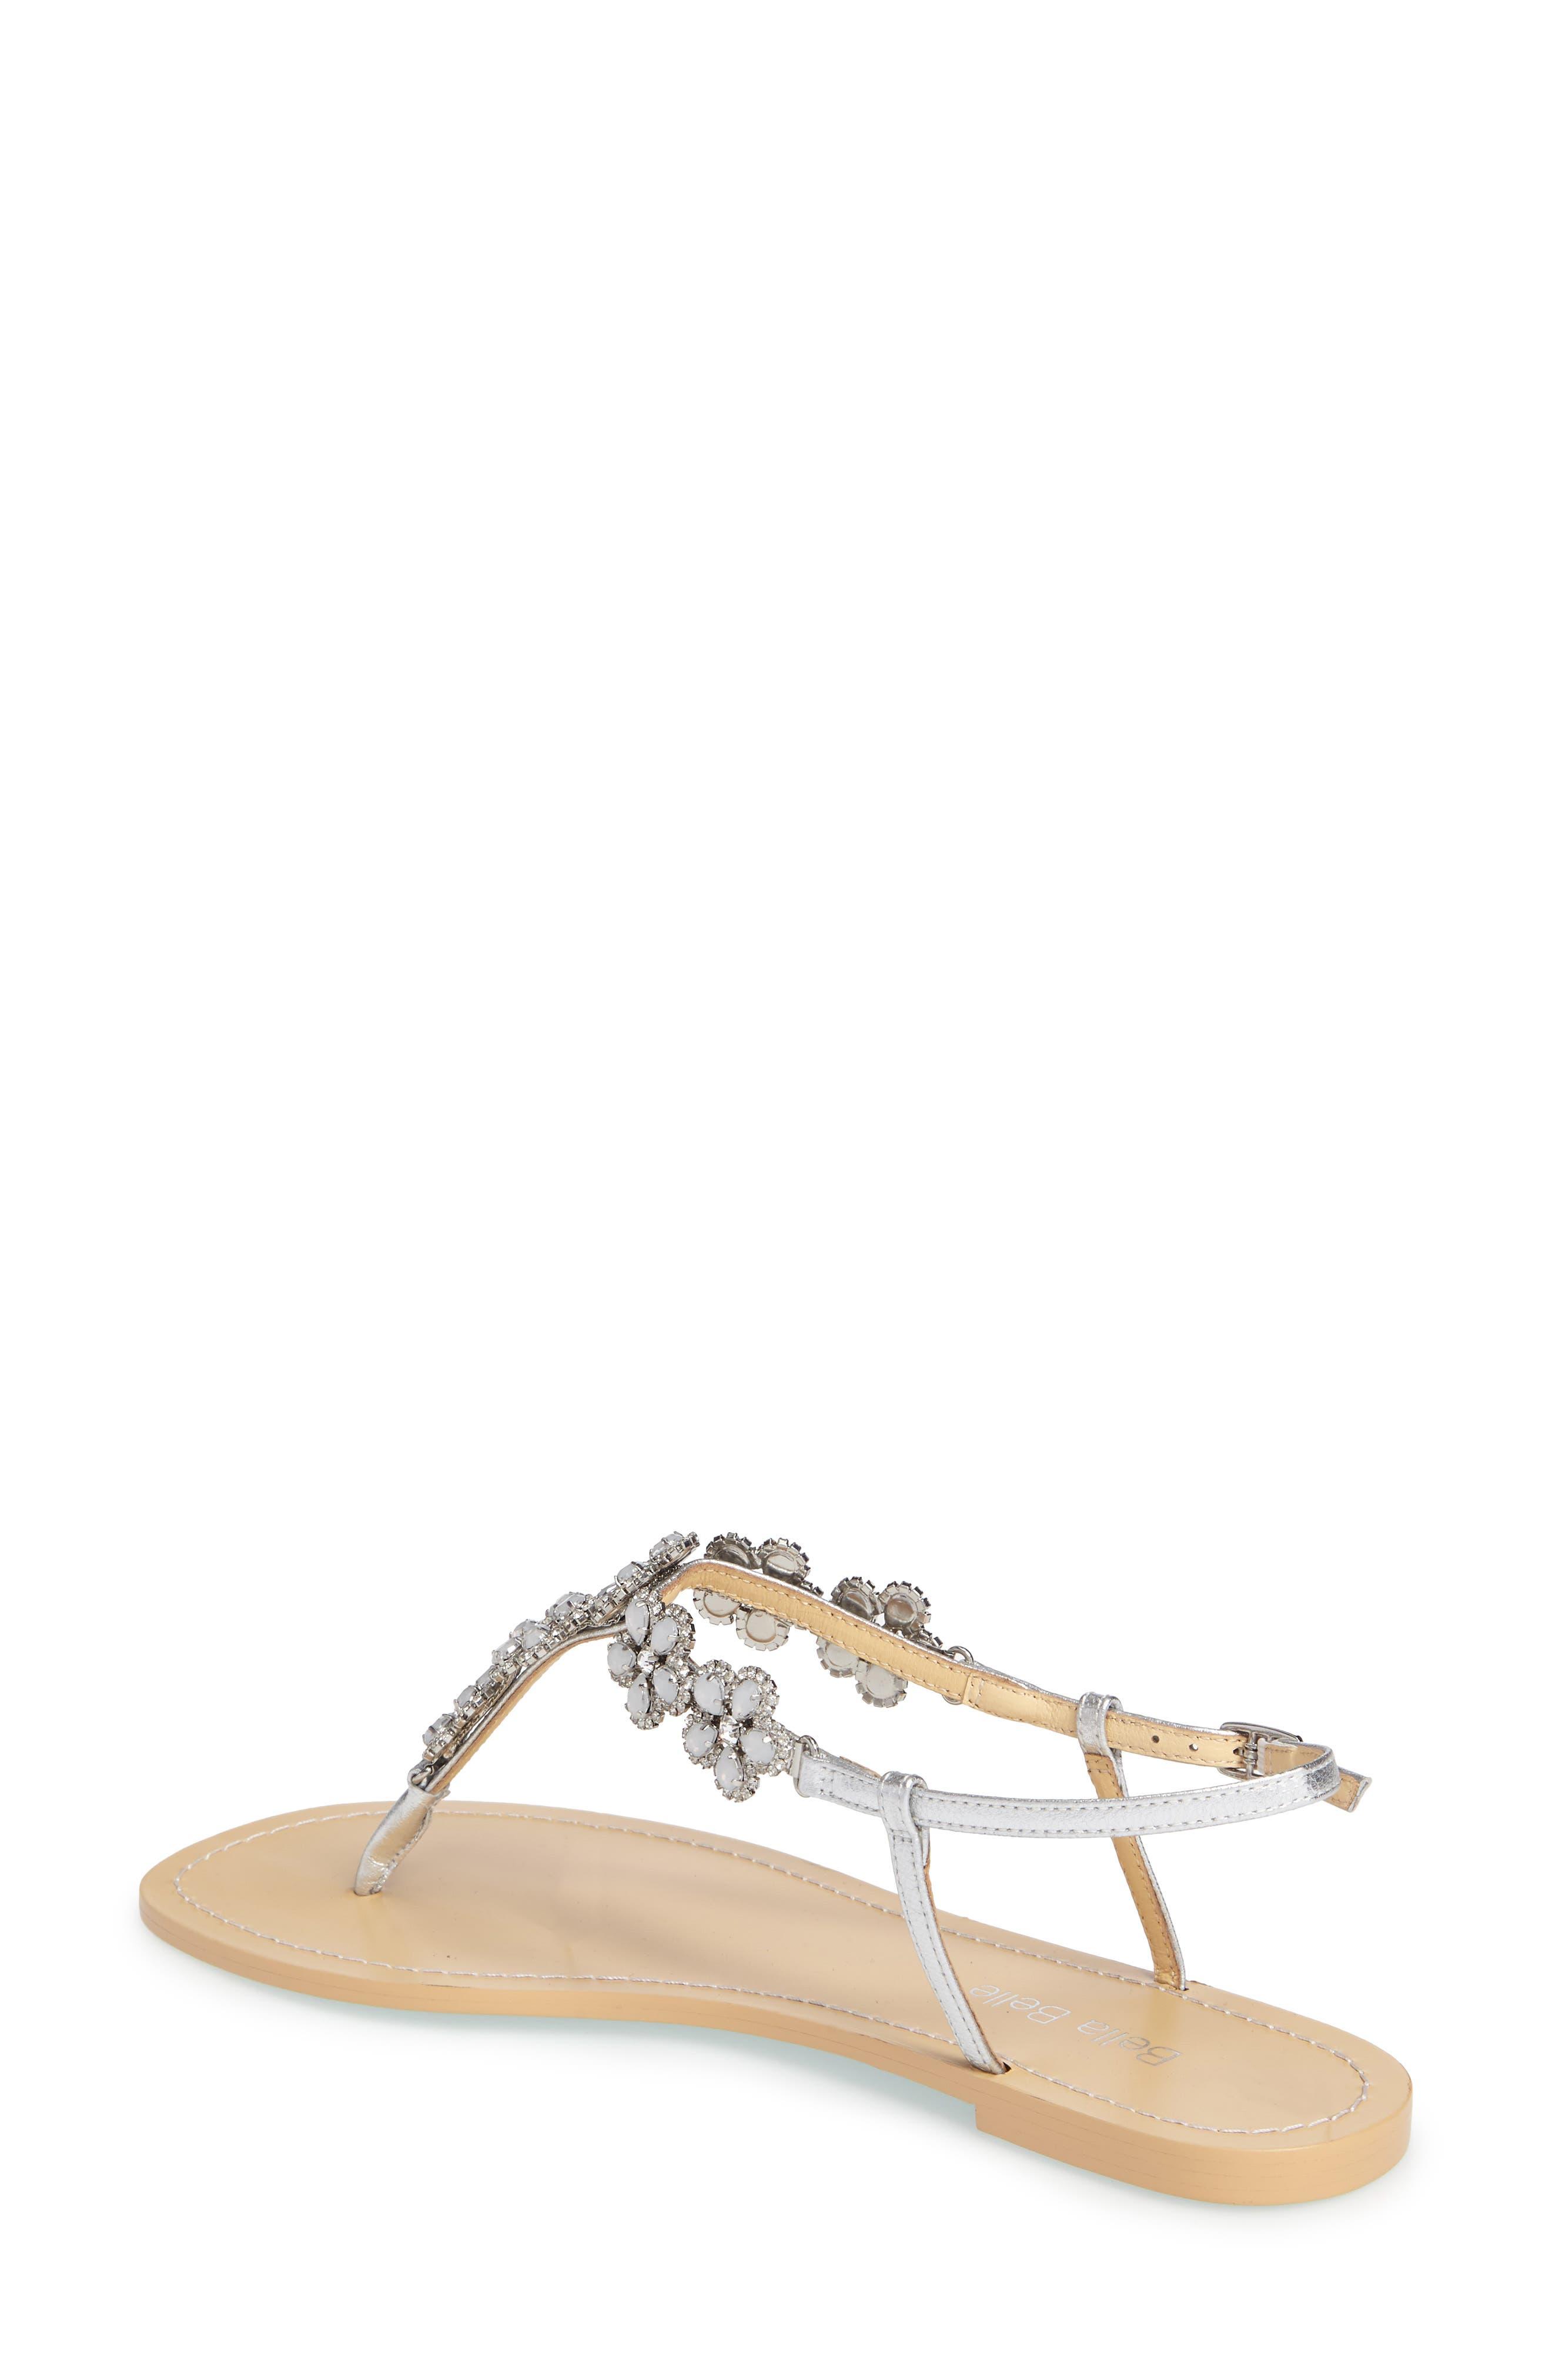 Rhea Sandal,                             Alternate thumbnail 2, color,                             Silver Leather